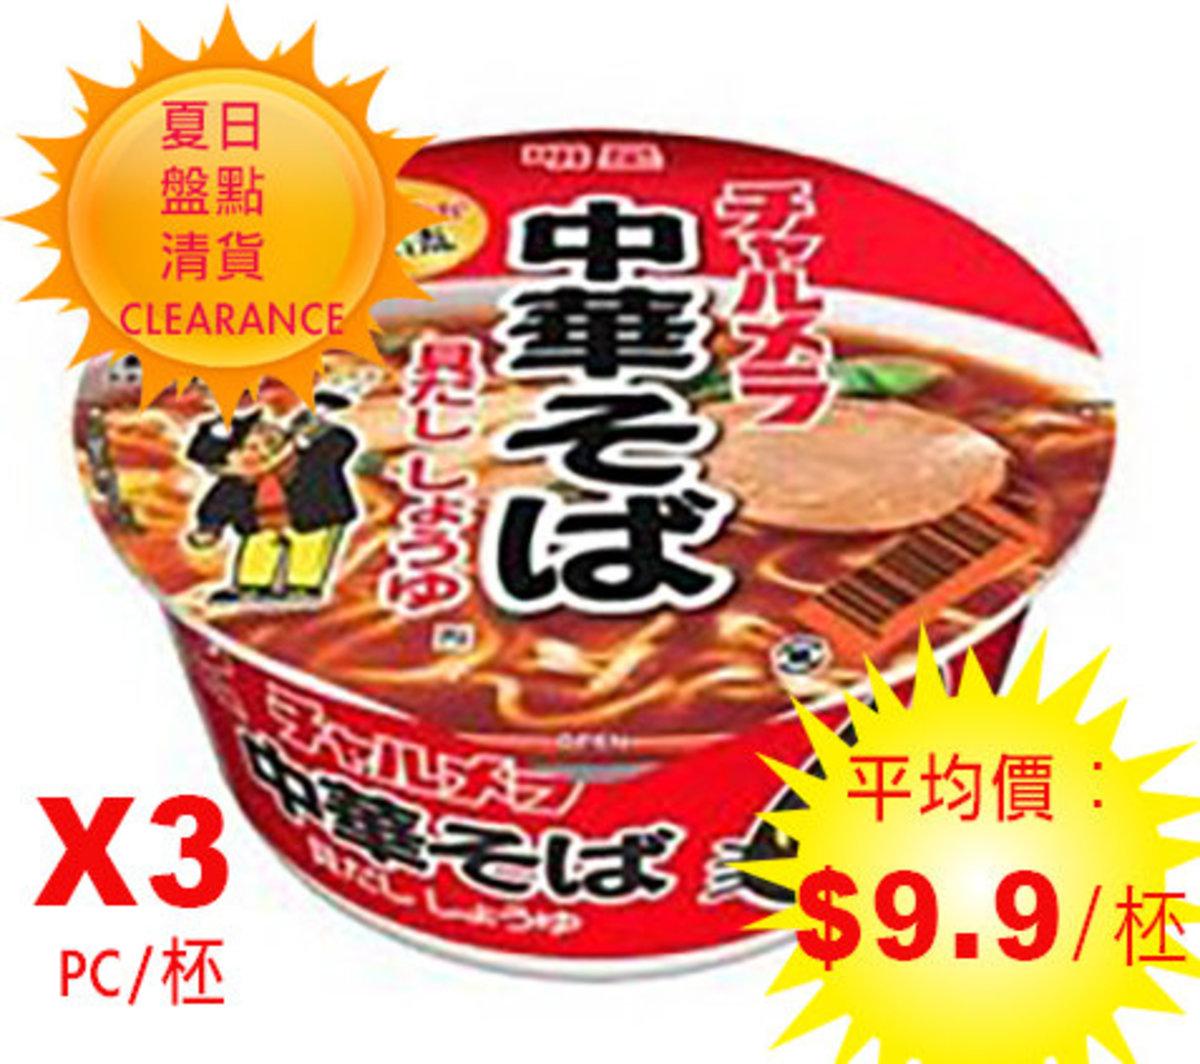 Chinese soba Shellfish & soy sauce 74GX 3 Cups